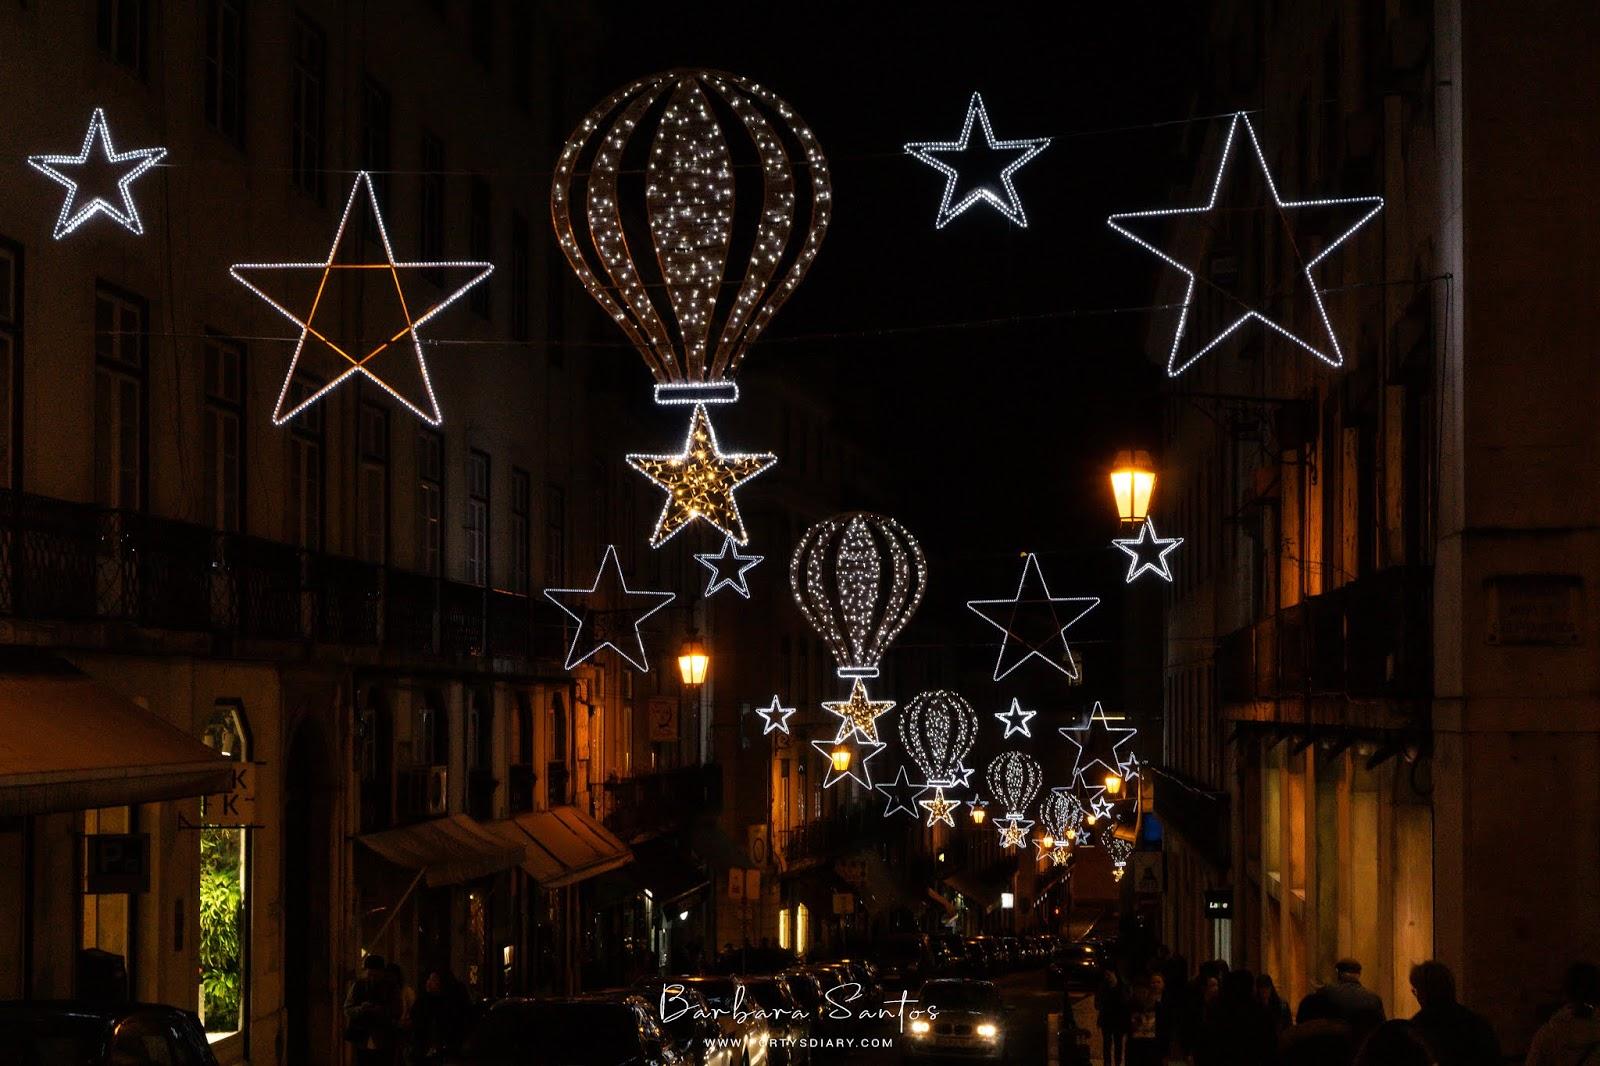 Rua Serpa Pinto (Chiado) - Christmas Decorations in Lisbon